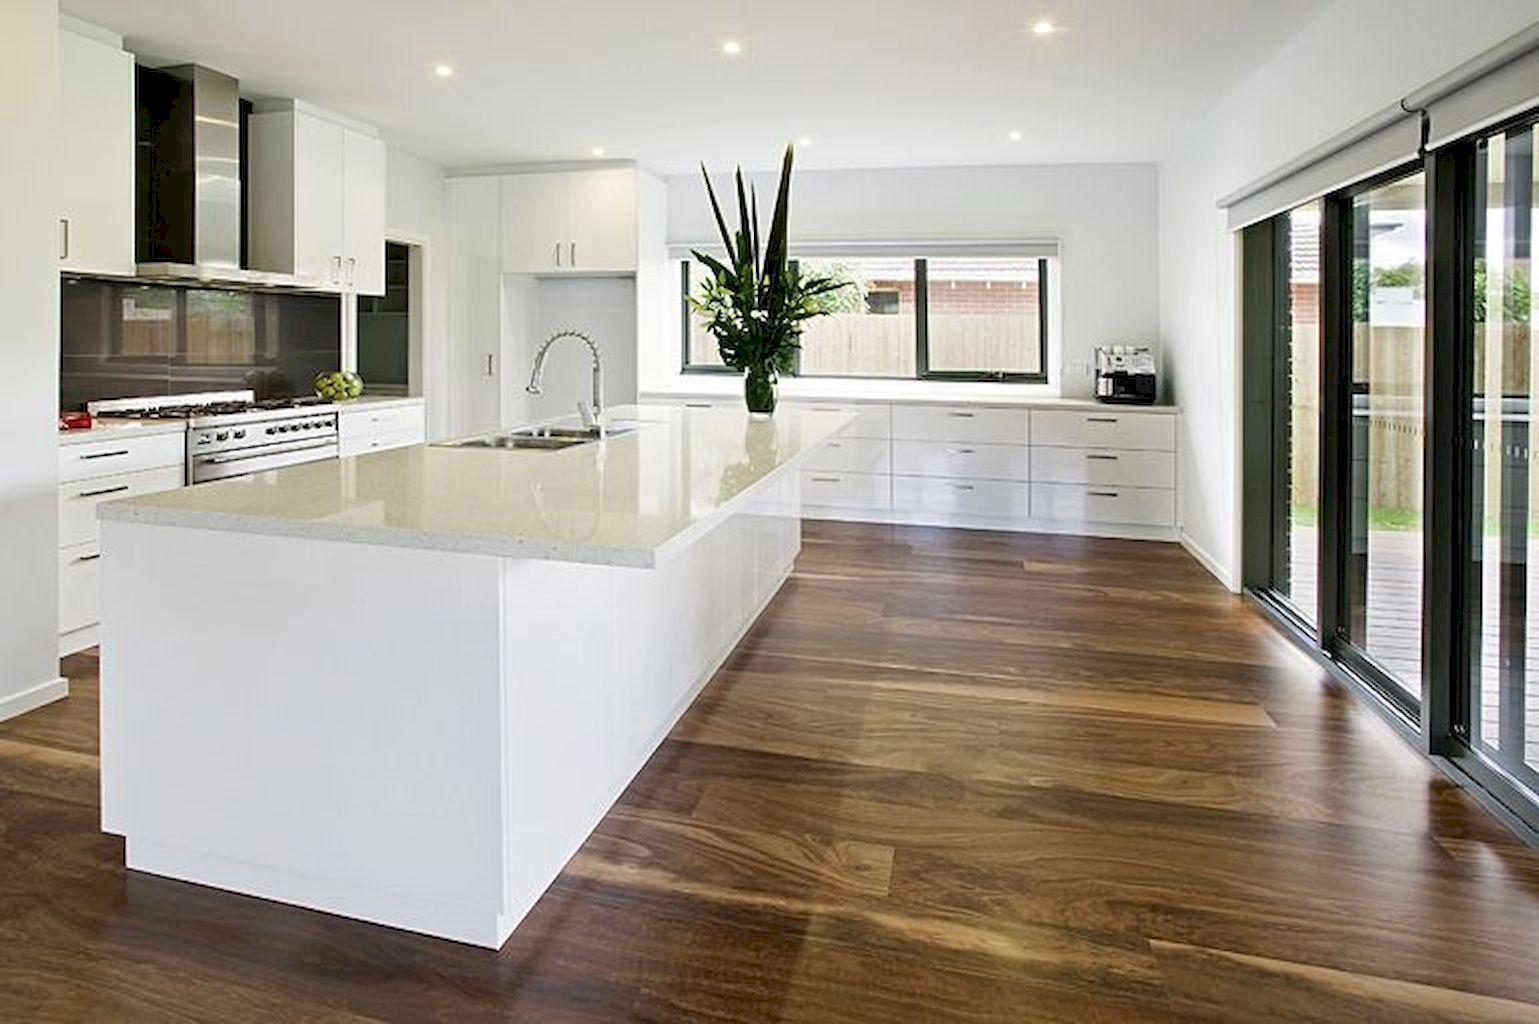 49 modern hardwood flooring design ideas for your kitchen with images floor design kitchen on kitchen flooring ideas id=39077